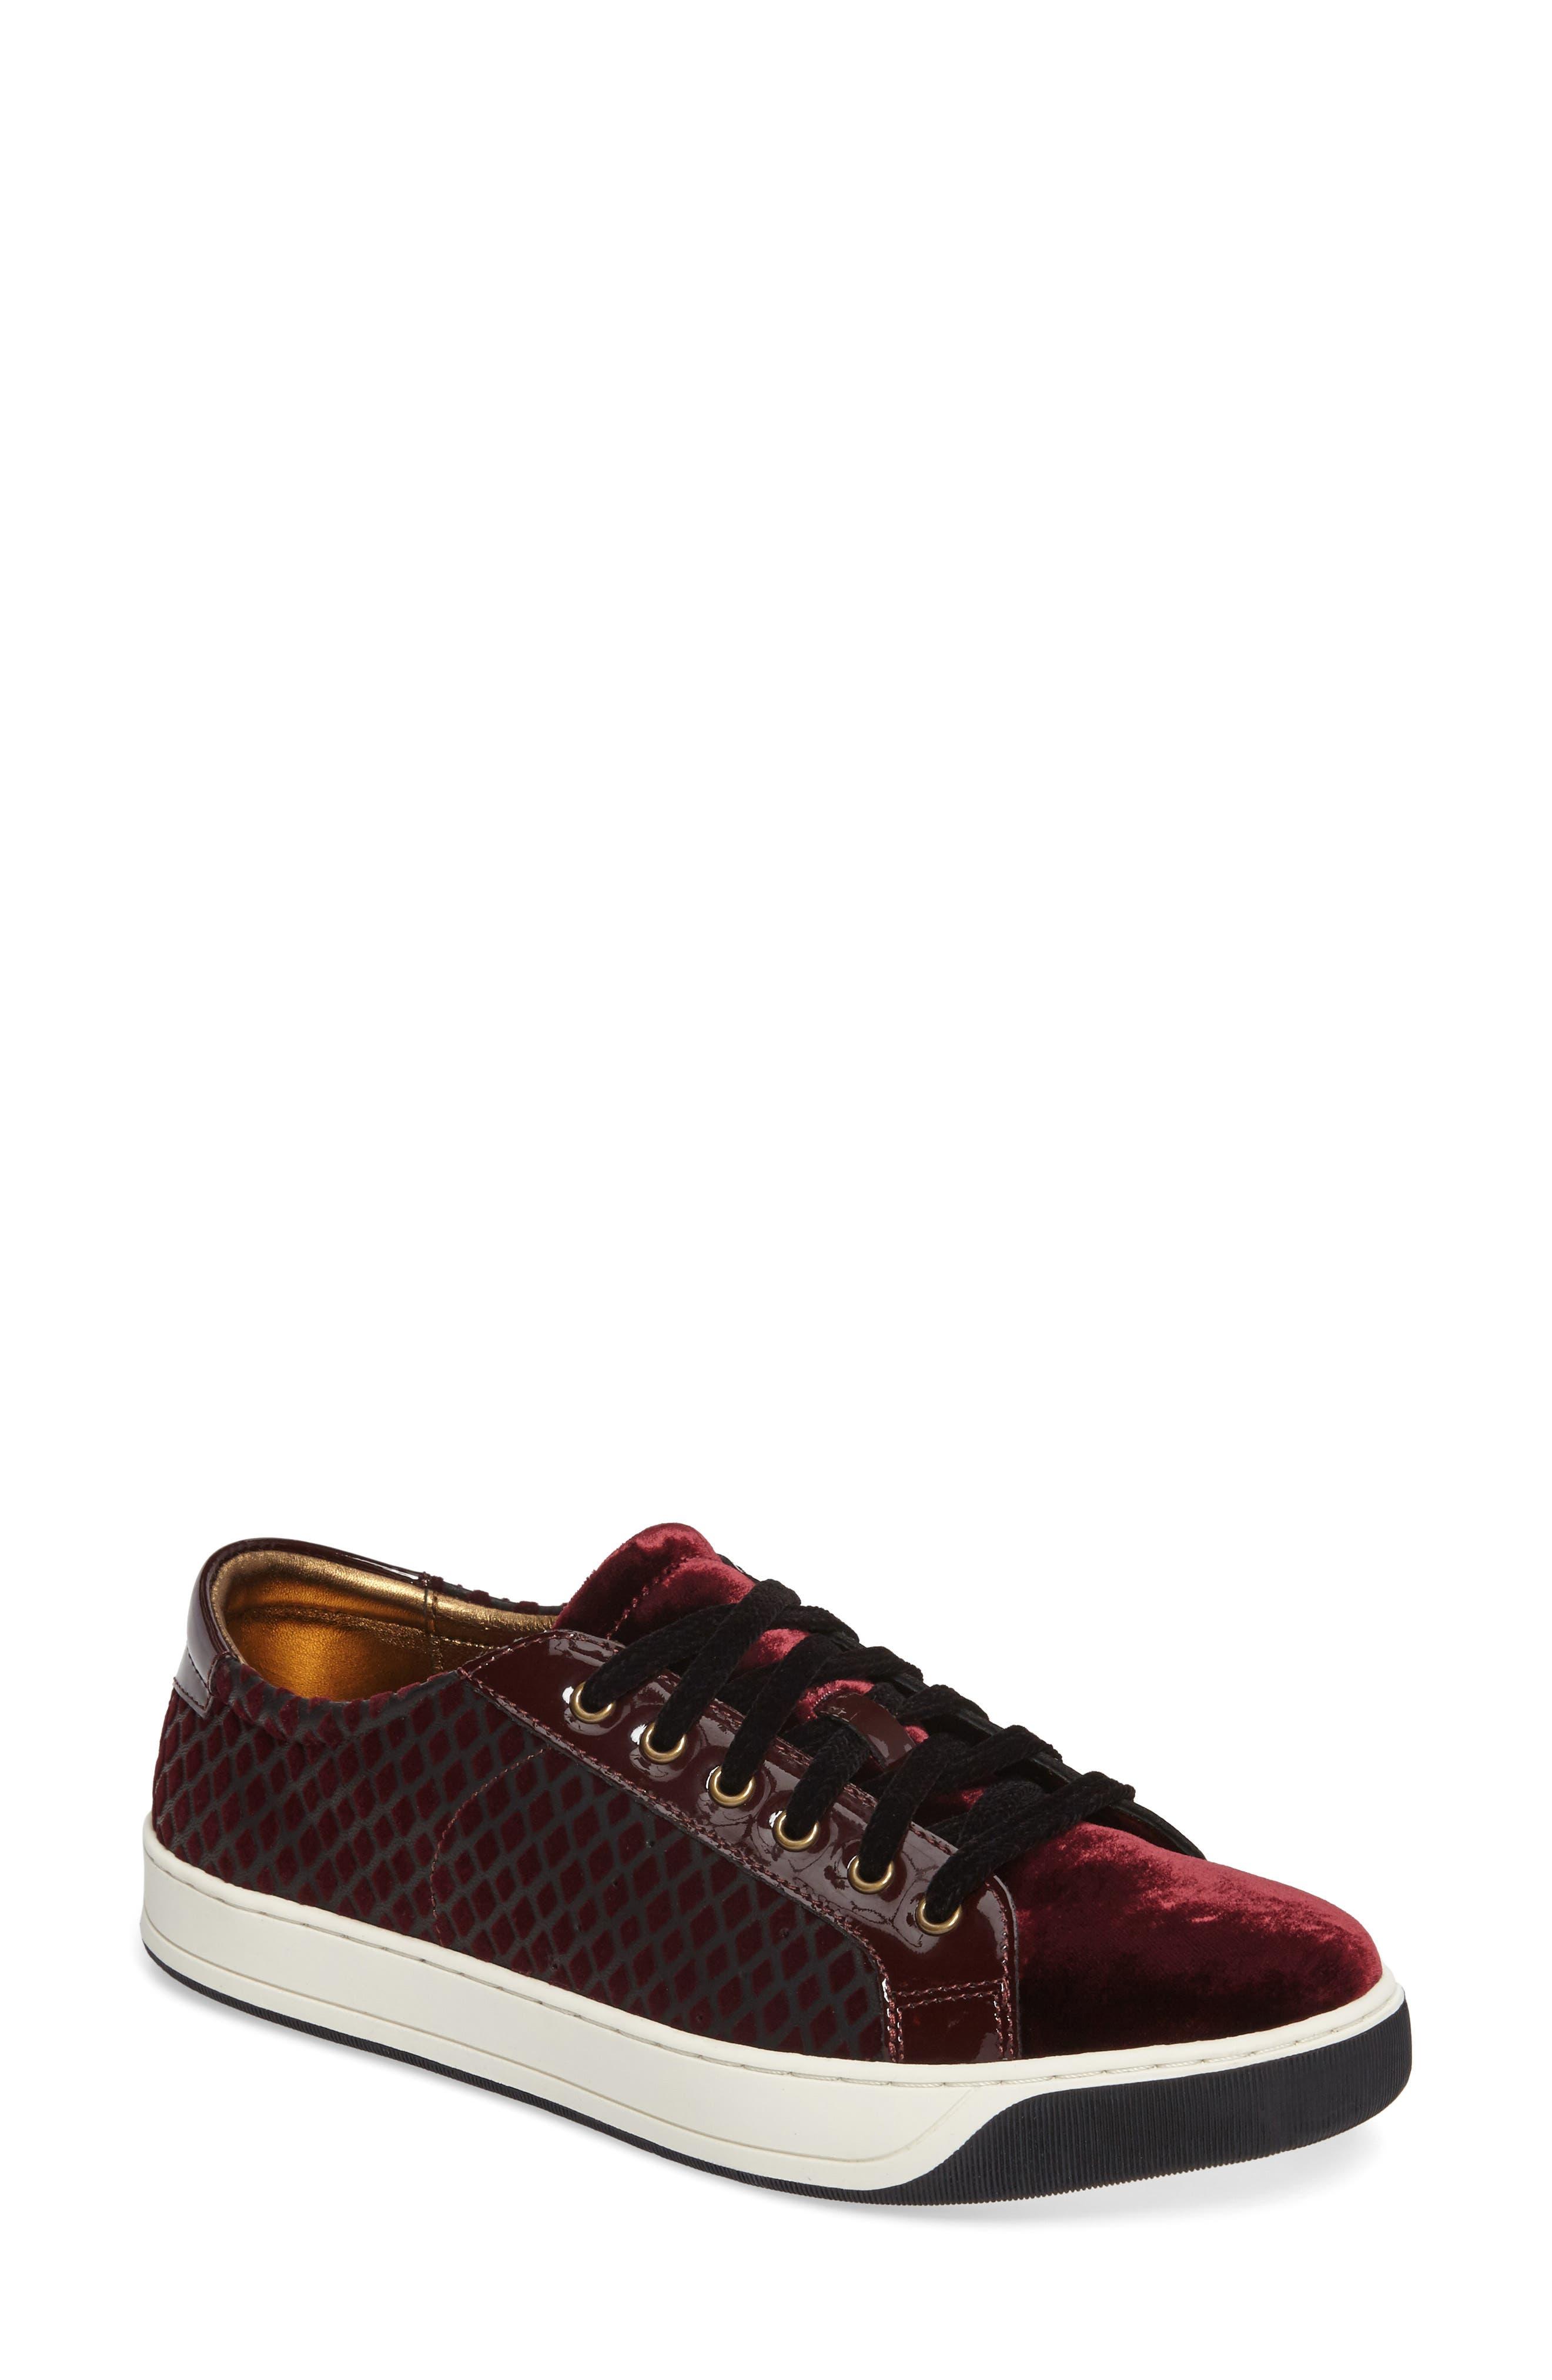 Main Image - Johnston & Murphy 'Emerson' Sneaker (Women)